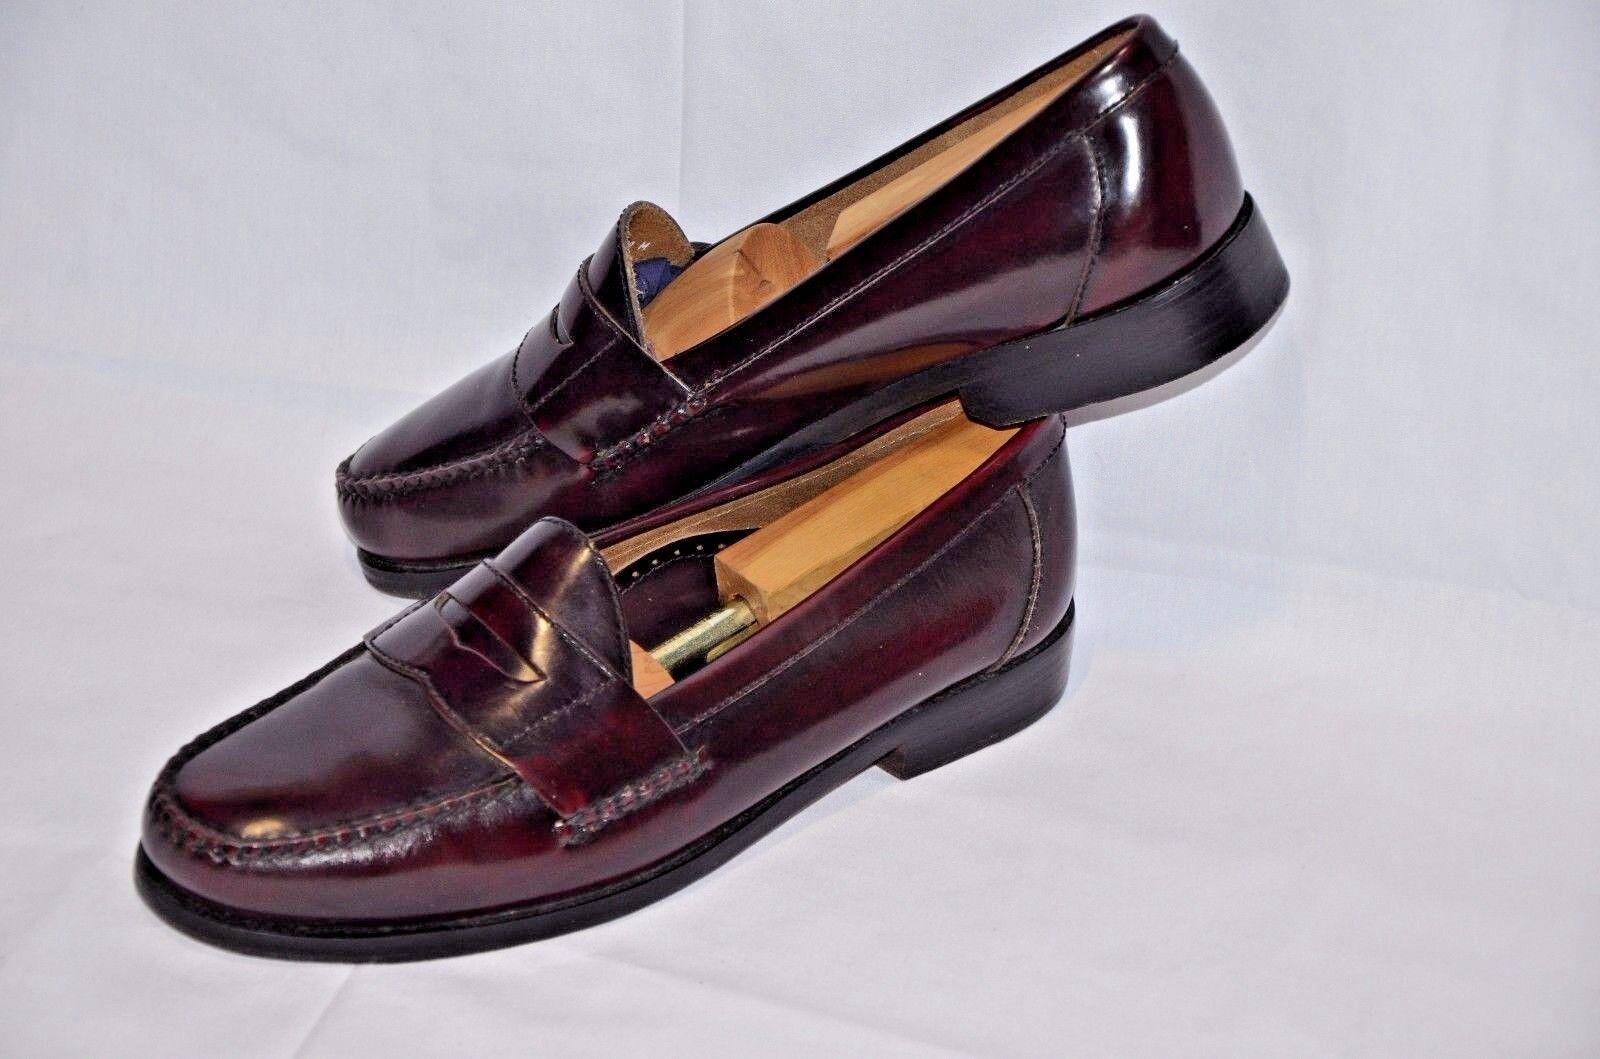 designer online Mint Sherman Brothers Philadelphia burgundy Penny Penny Penny Loafers scarpe Dimensione 12 40-952  marchi di moda